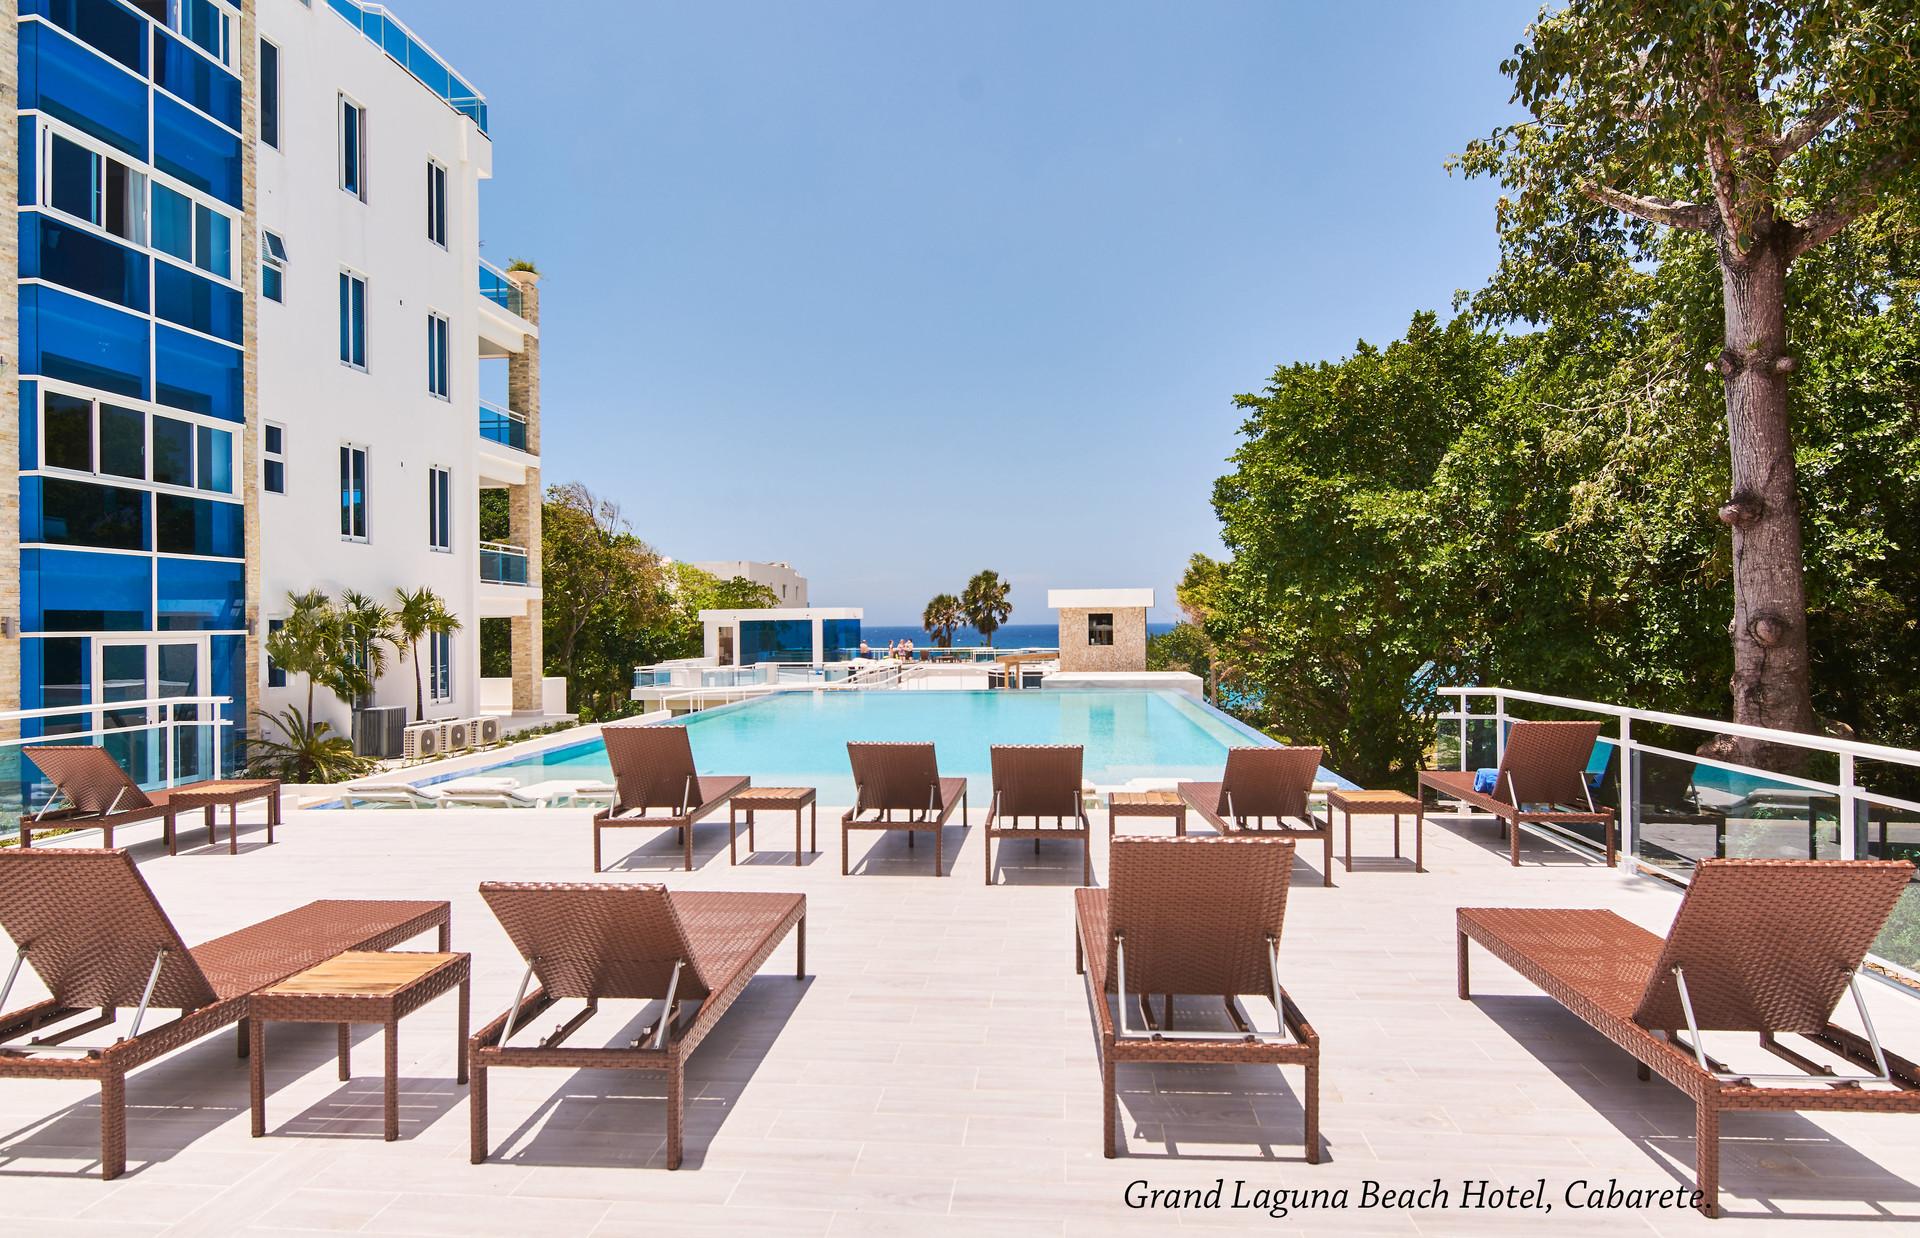 Grand Laguna Beach Hotel, Cabarete.